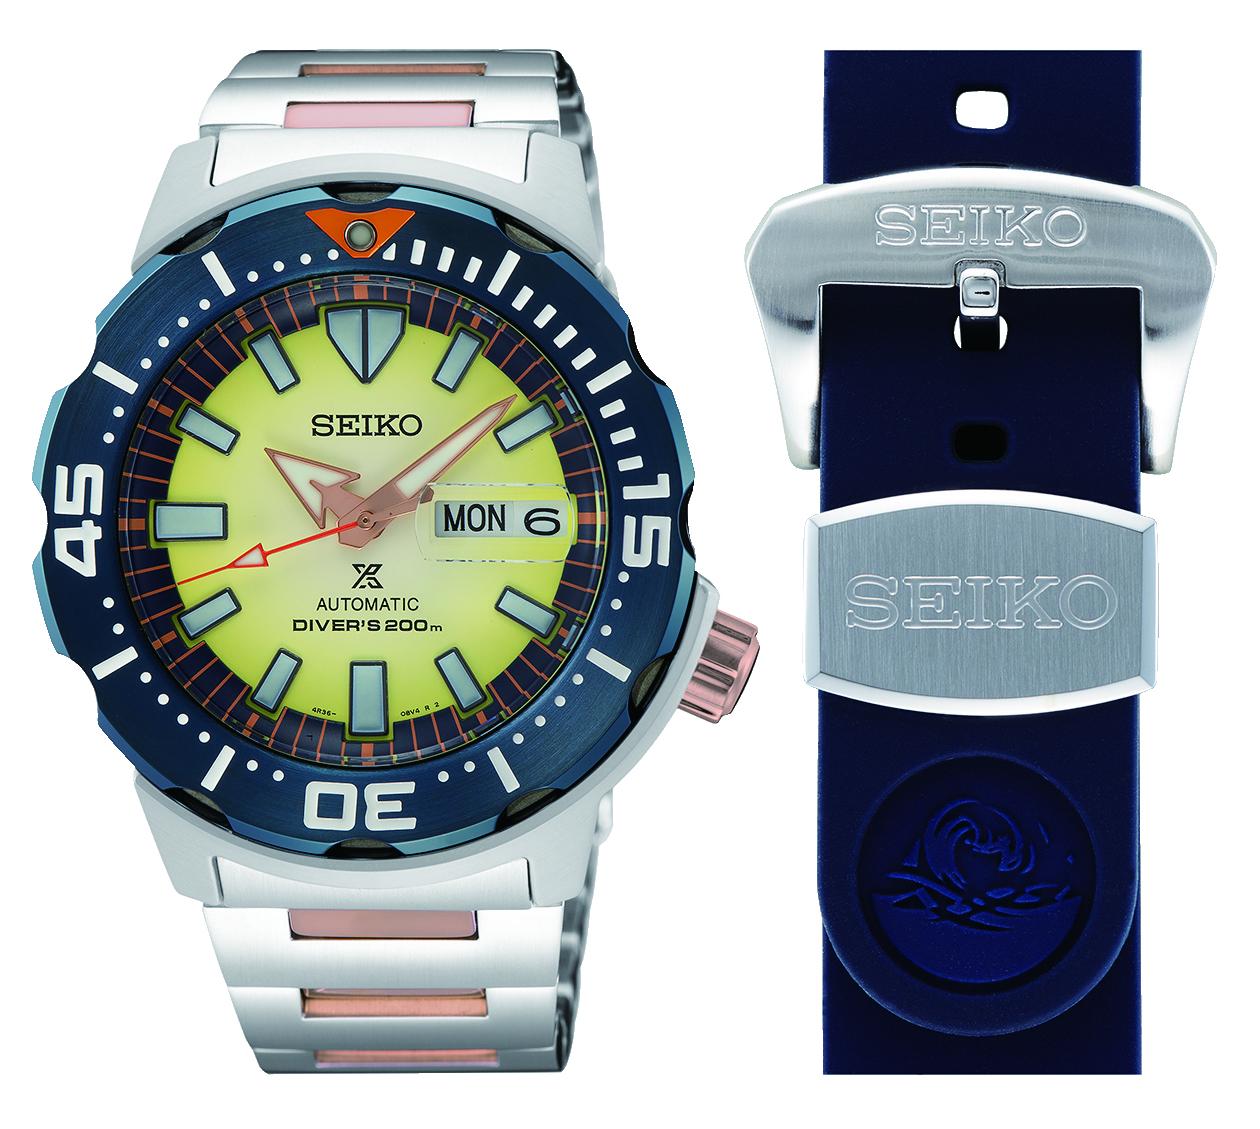 Seiko Unveils Limited Philippine - Edition Seiko Diver's Watch